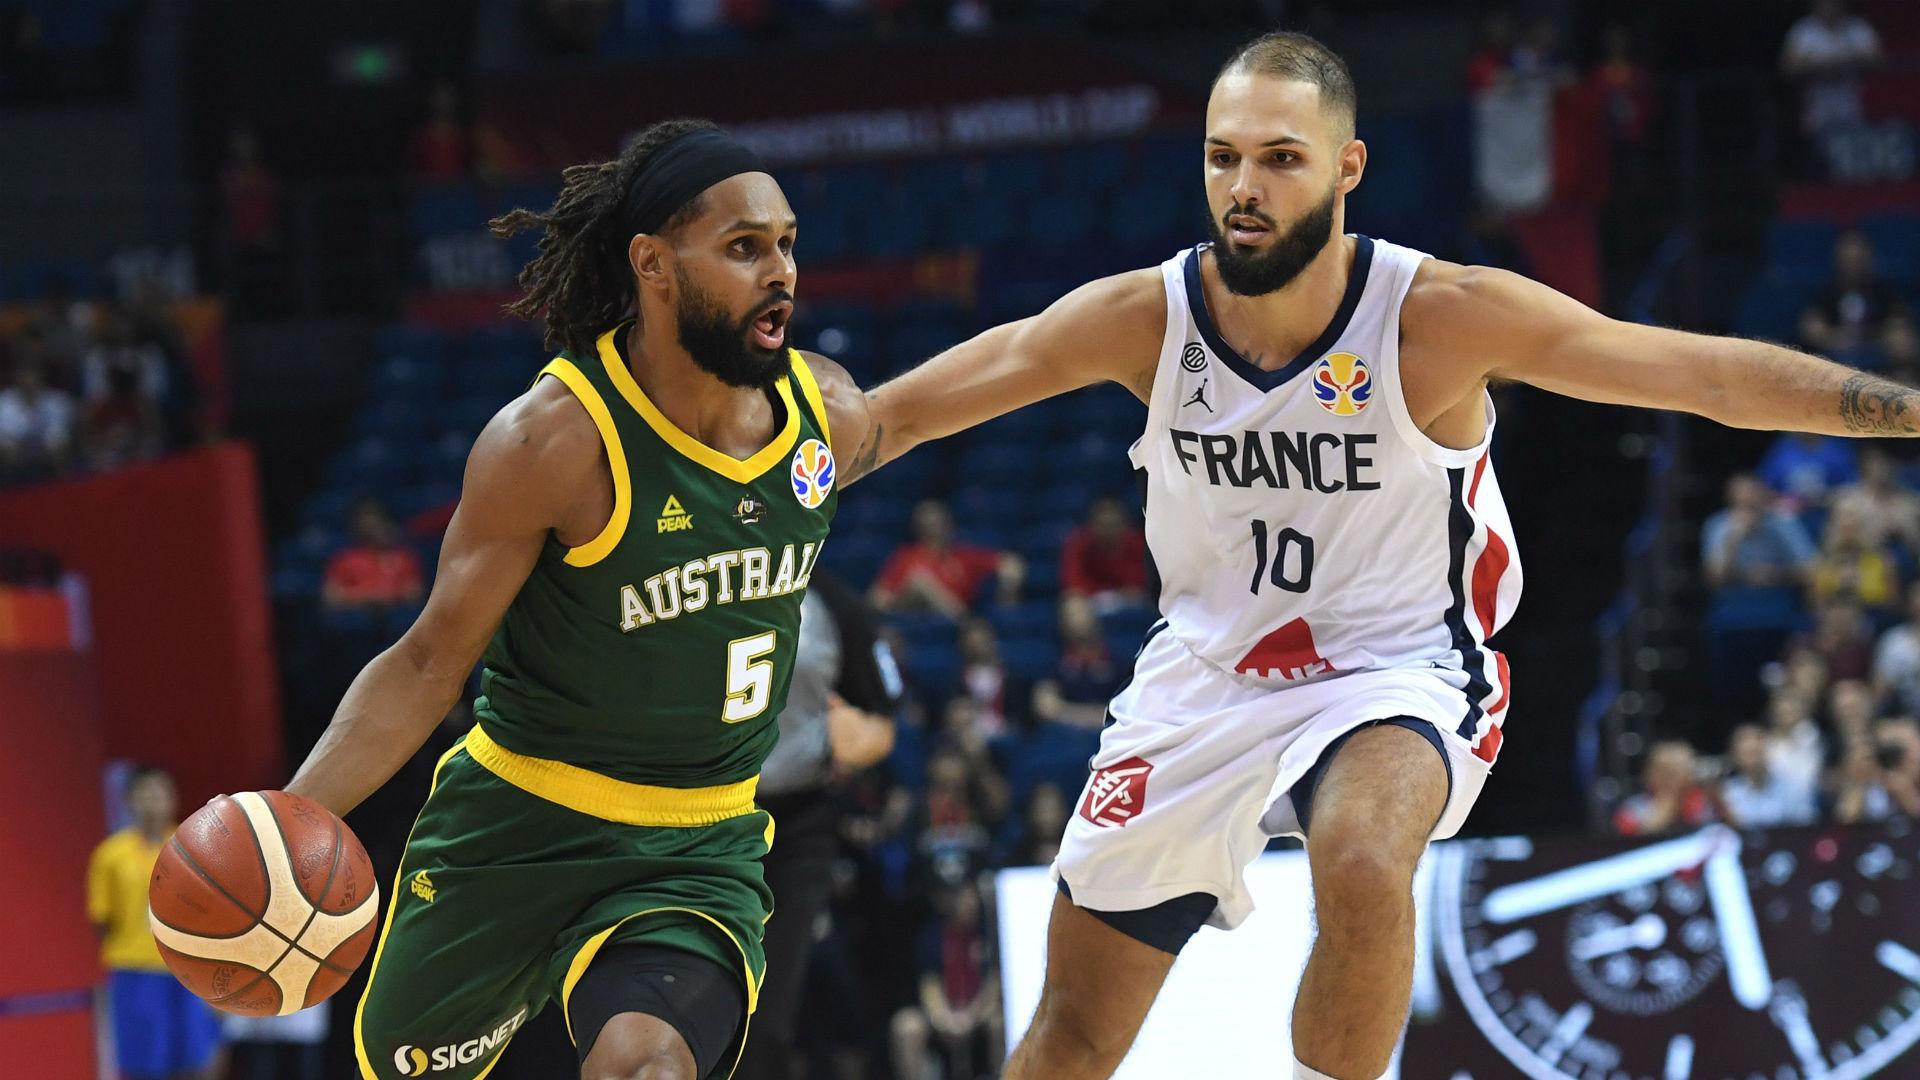 FIBA Basketball World Cup 2019: Biggest keys to watch in Australia vs. France